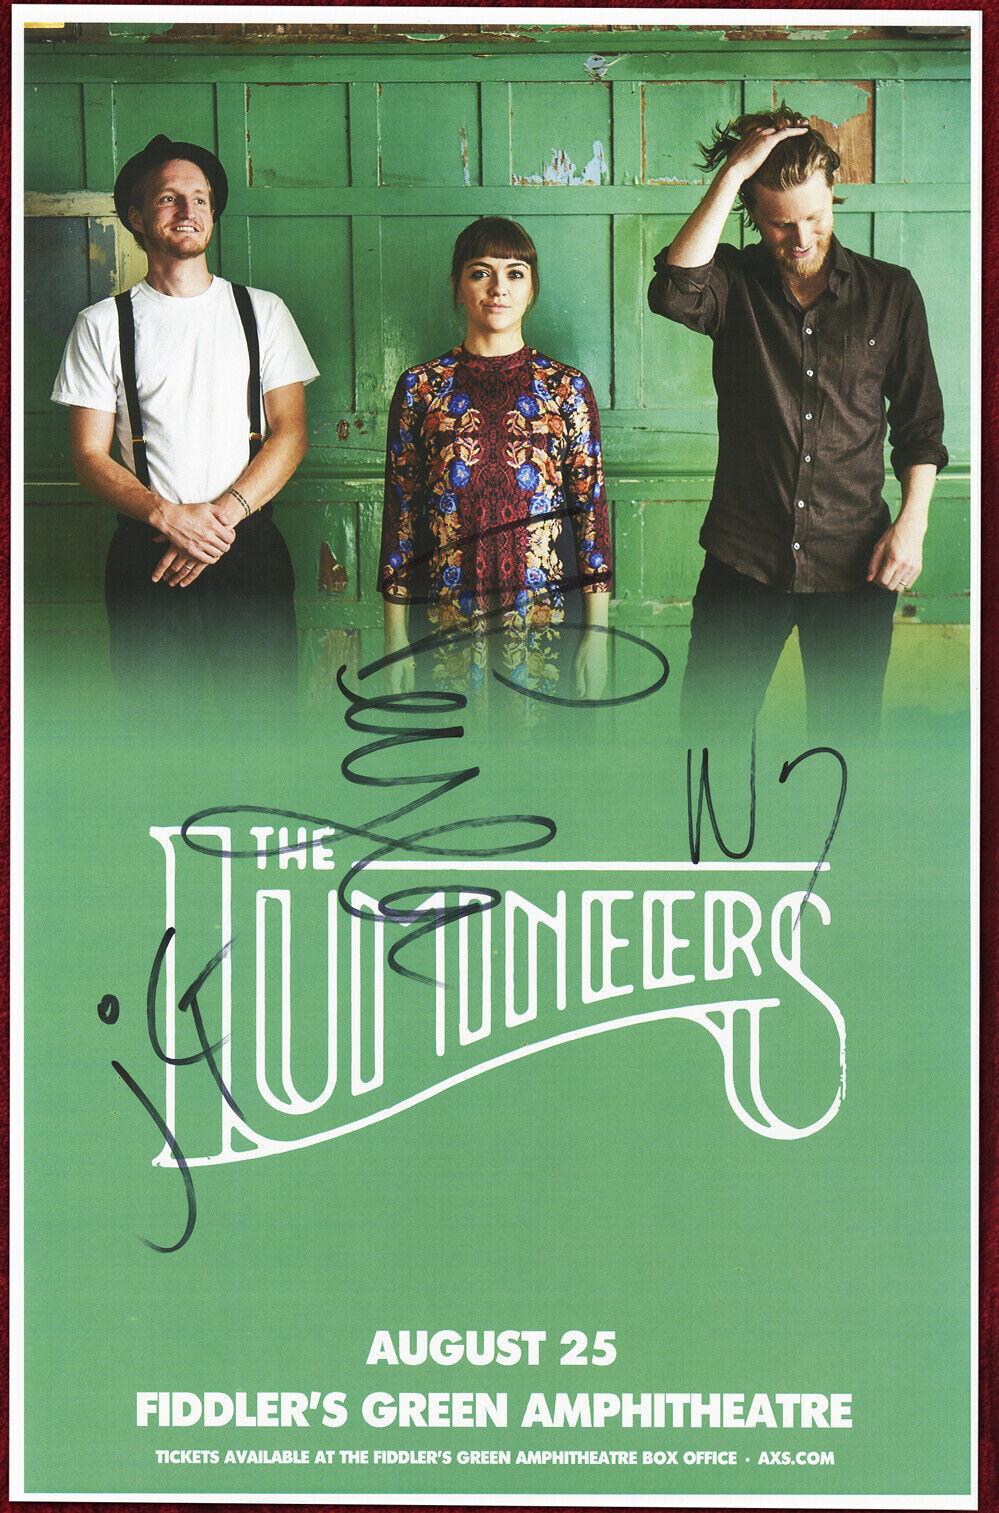 The Lumineers Autographed Concert Poster 2017 Wesley Schultz, Jeremiah Fraites - $26.00